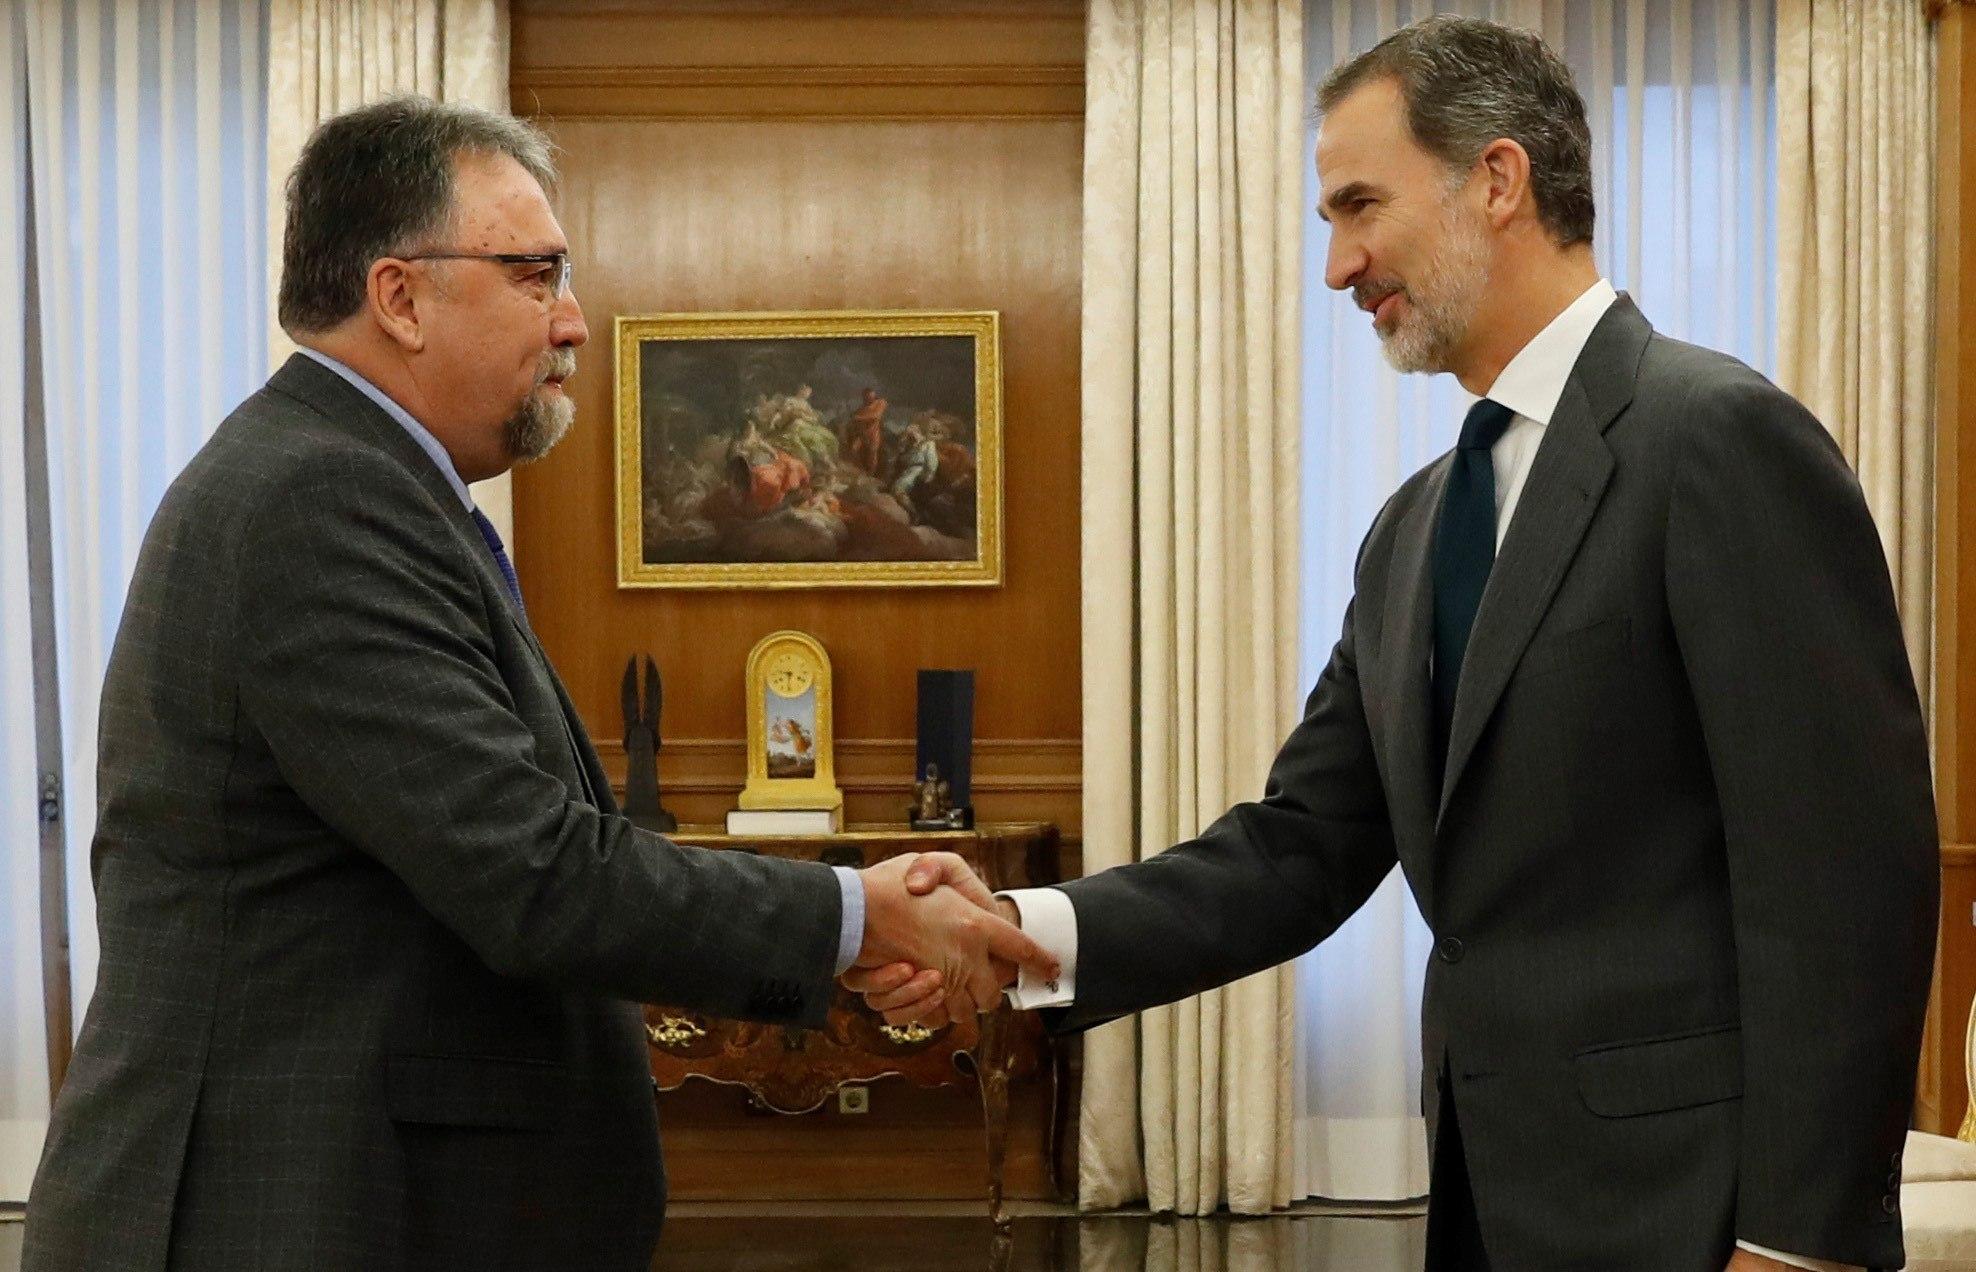 El rey Felipe recibe al diputado de Foro Asturias Isidro Martínez Oblanca/><figcaption class=